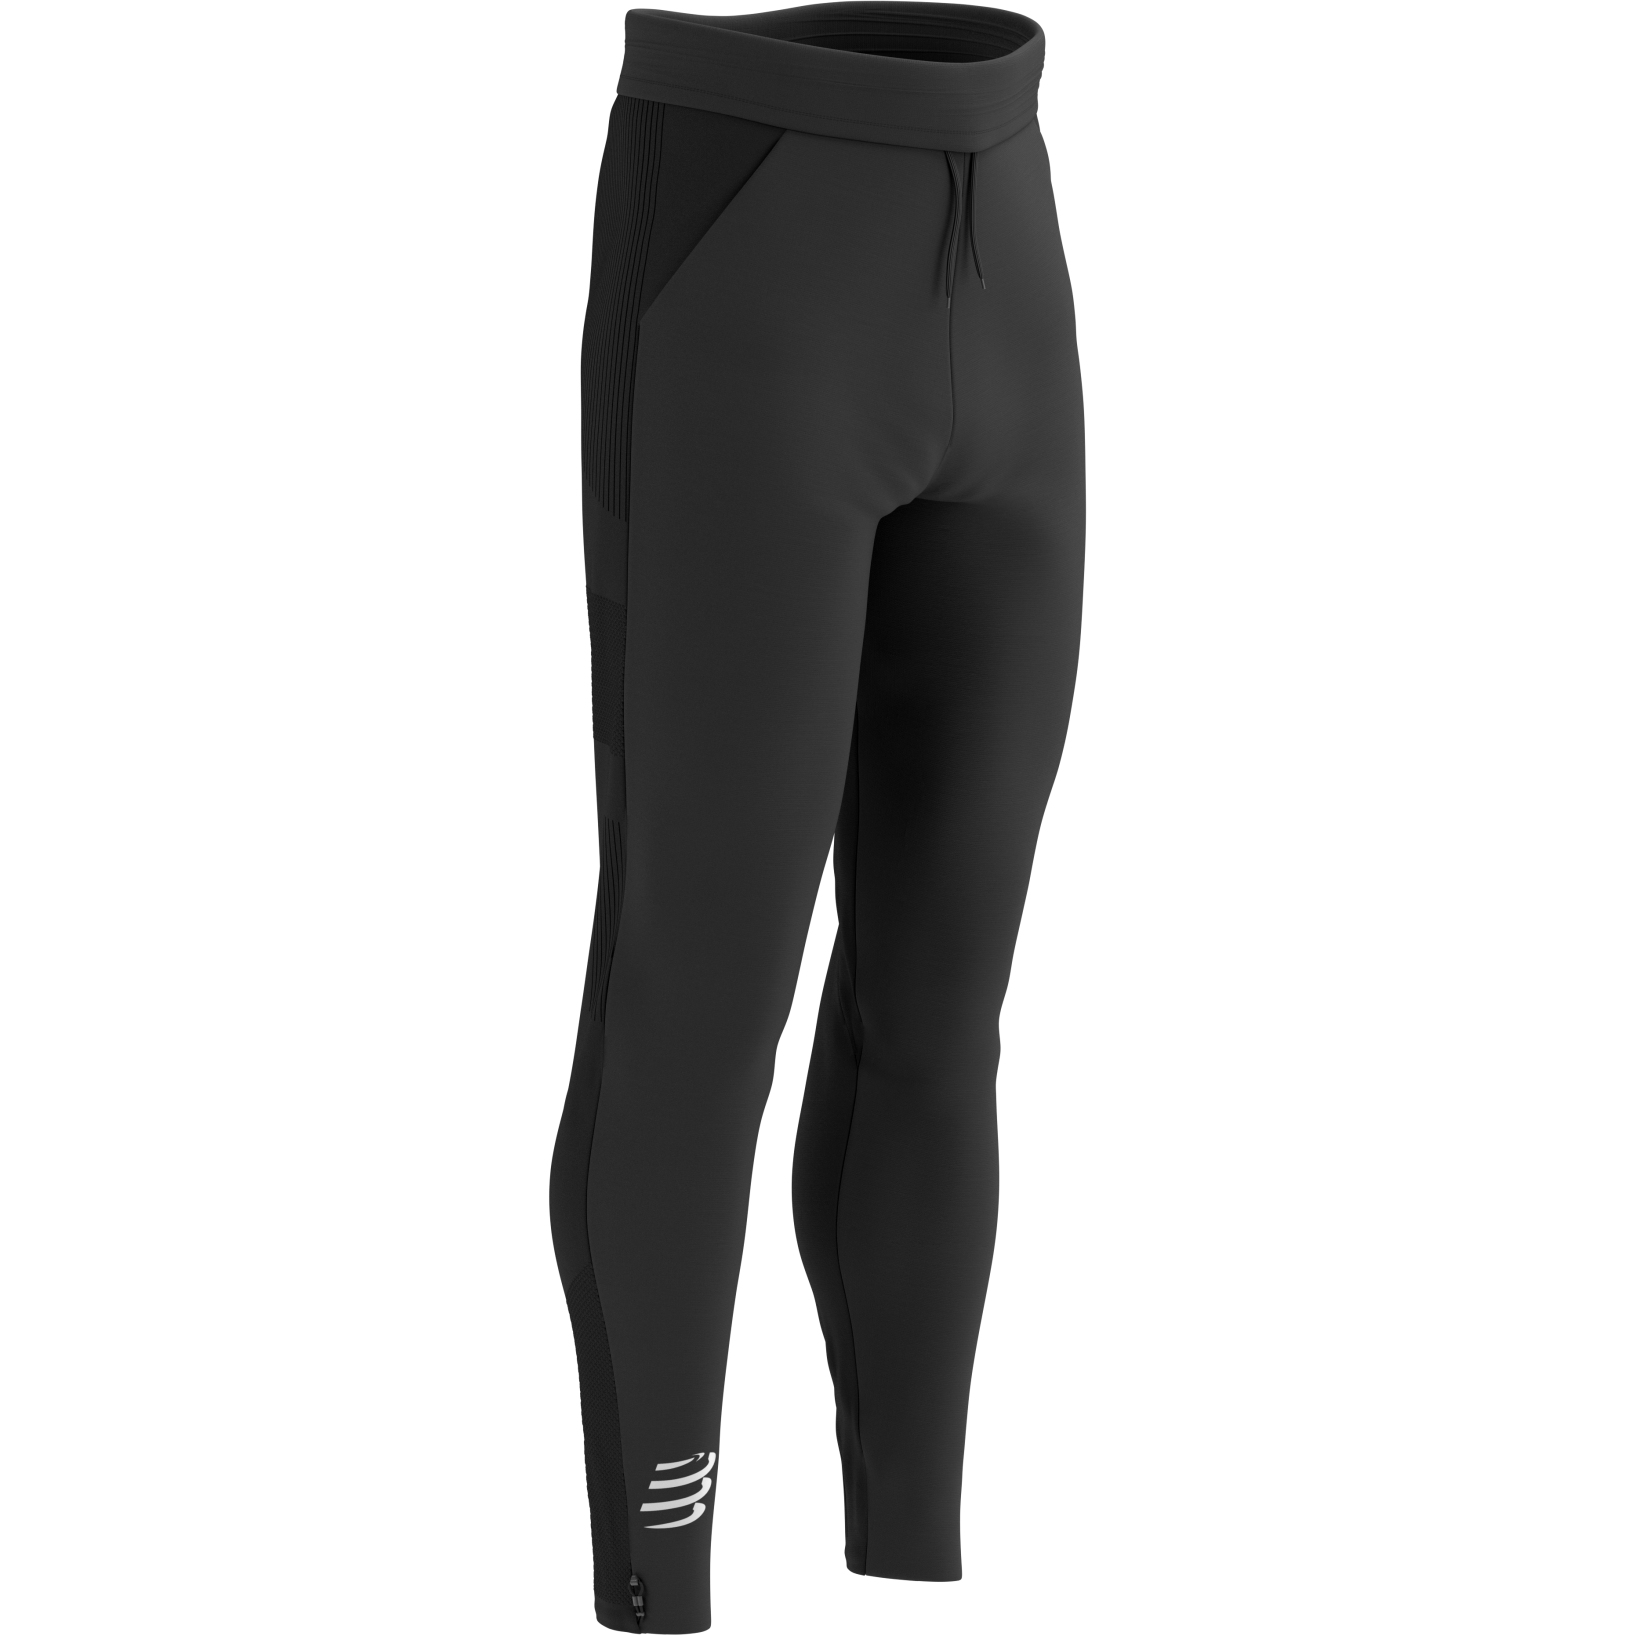 Foto de Compressport Hybrid Seamless Hurricane Pantalones - black